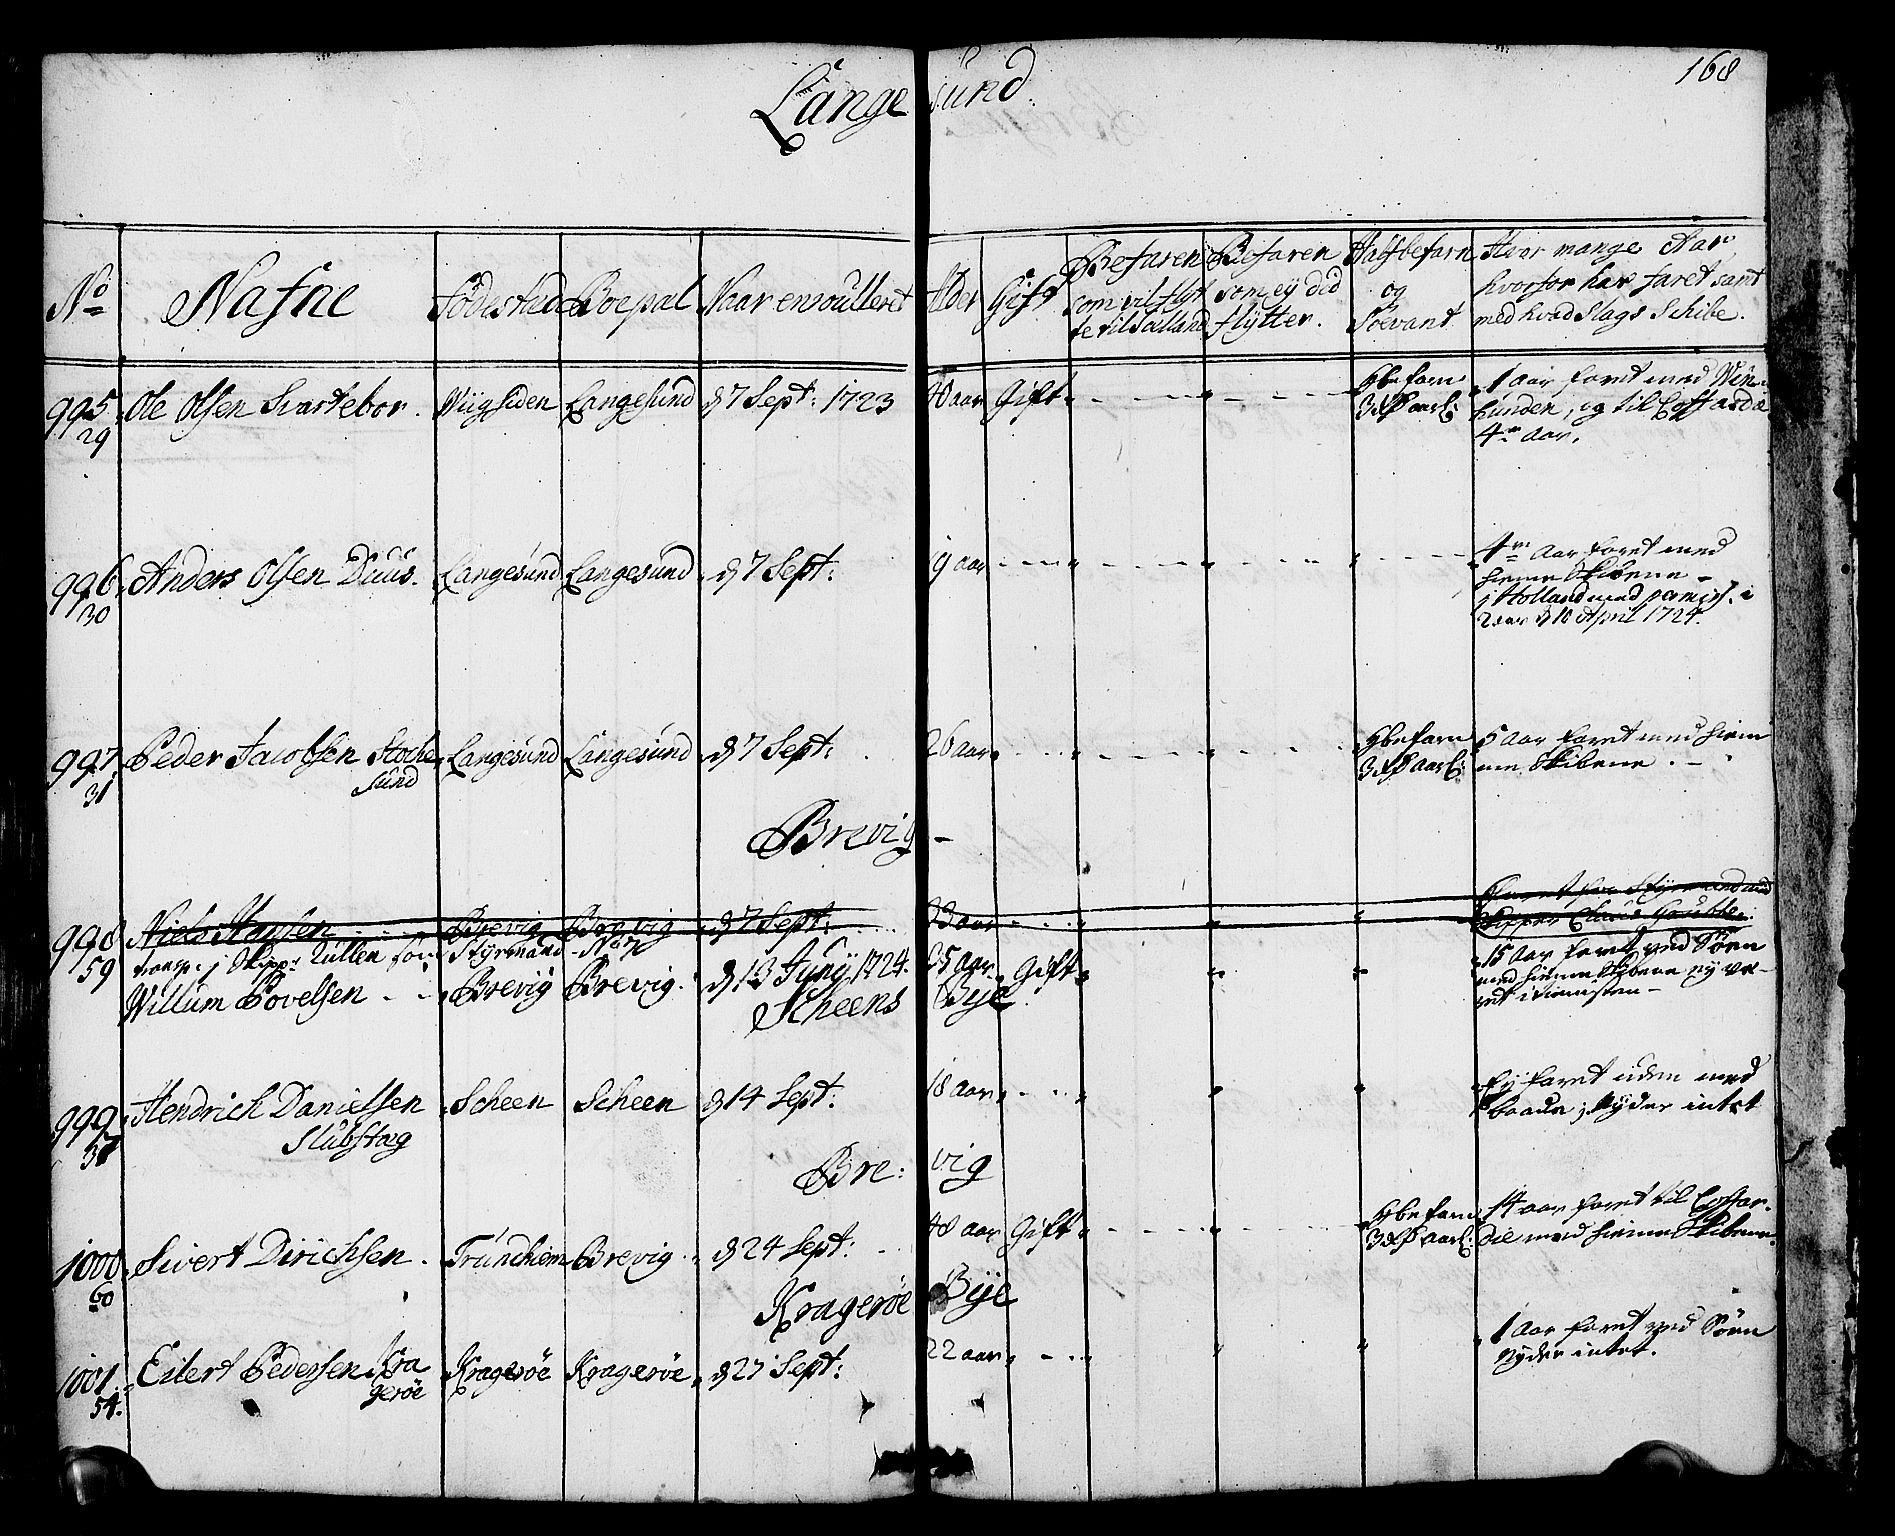 SAKO, Drammen innrulleringsdistrikt, F/Fa/L0002: Hovedrulle, 1723-1726, p. 169